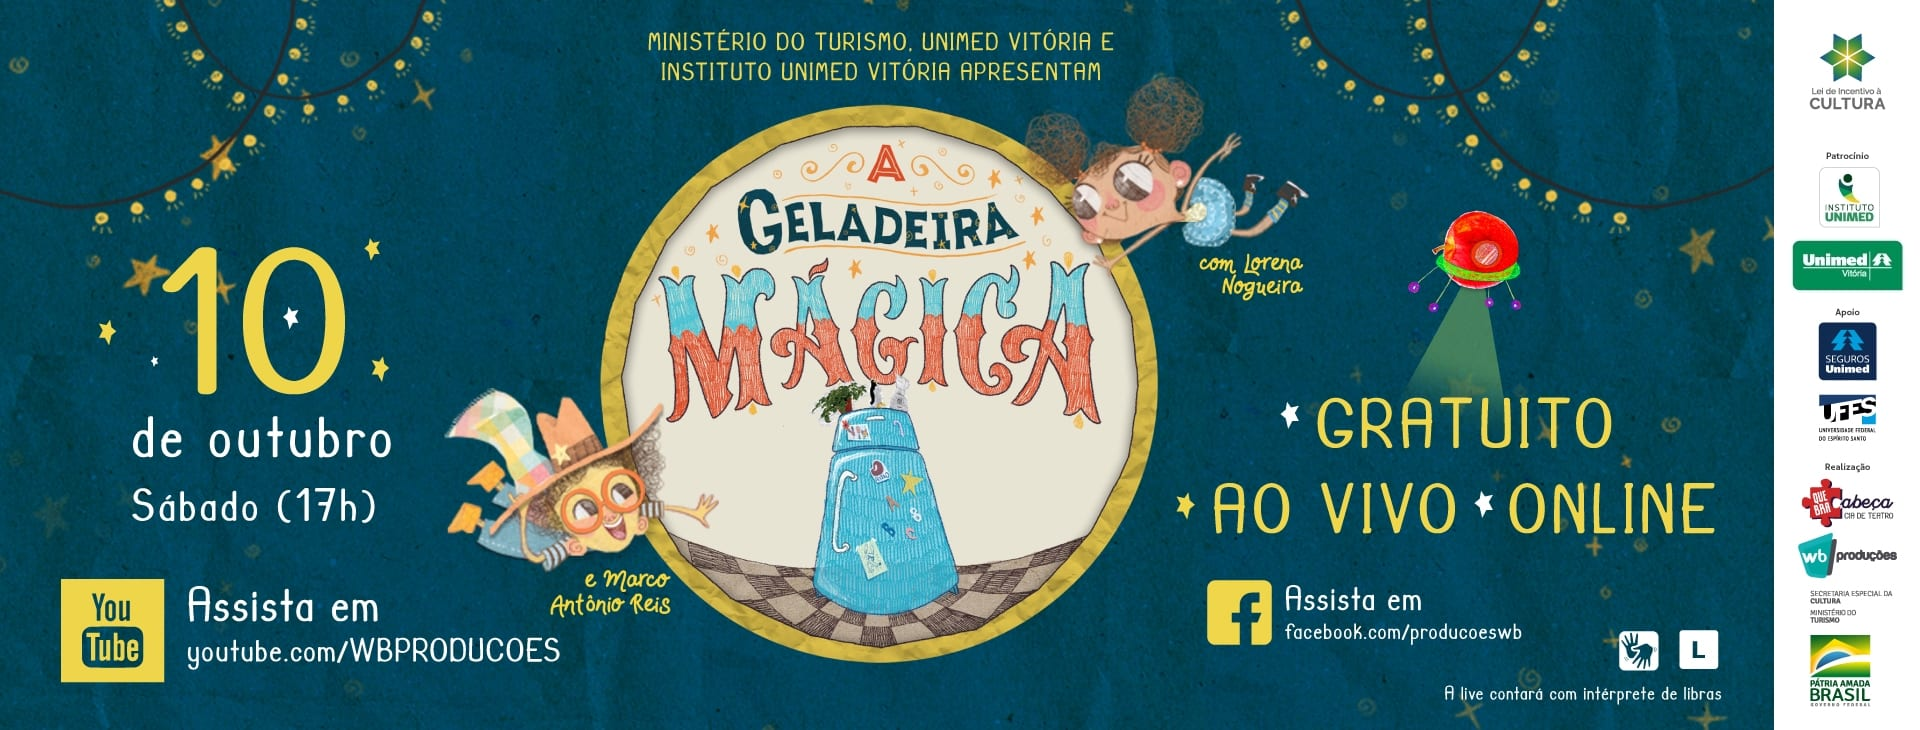 geladeira_magica_banner_site